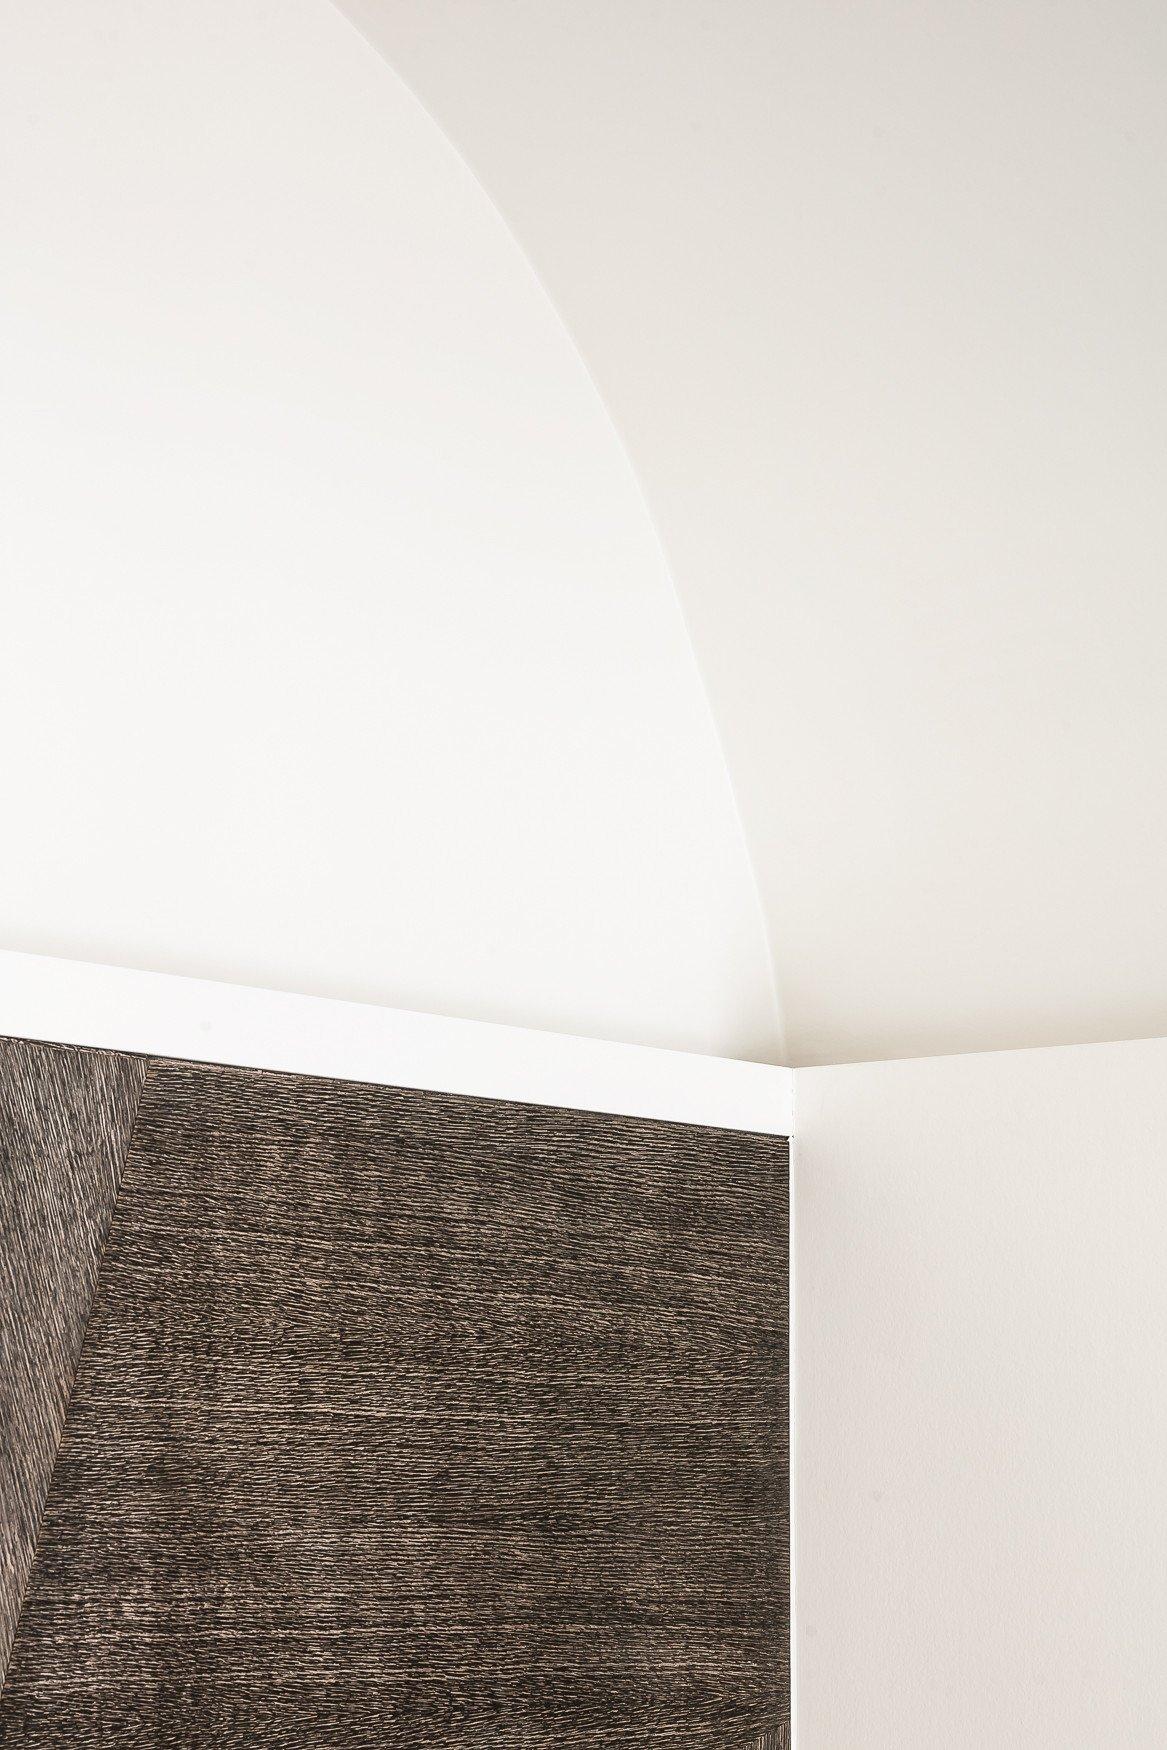 Rietveldprojects.be-villa-Denil-office21